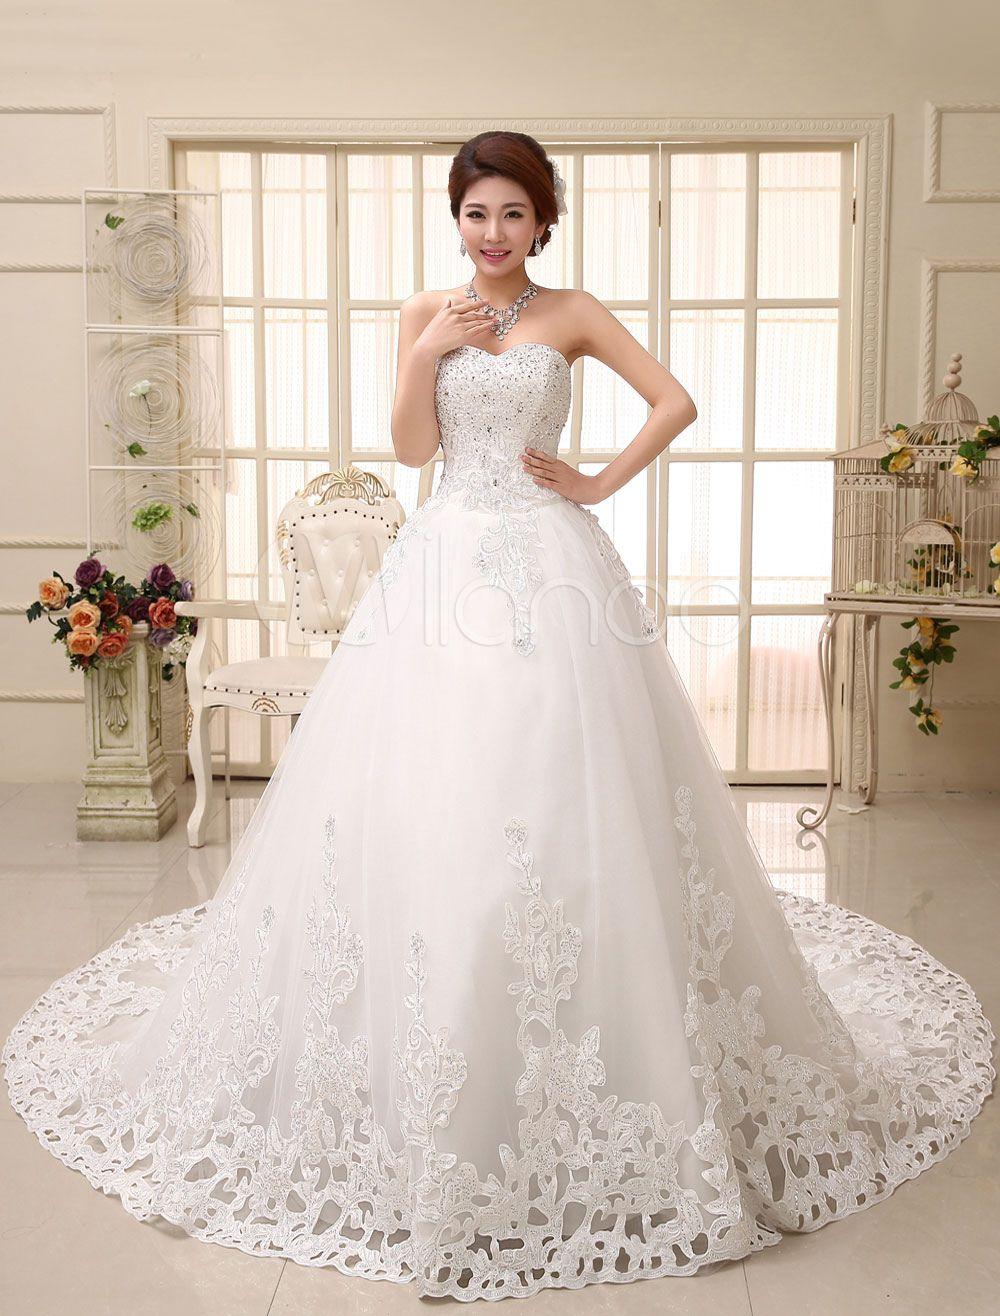 Lace wedding dress princess ball gown bridal dress ivory